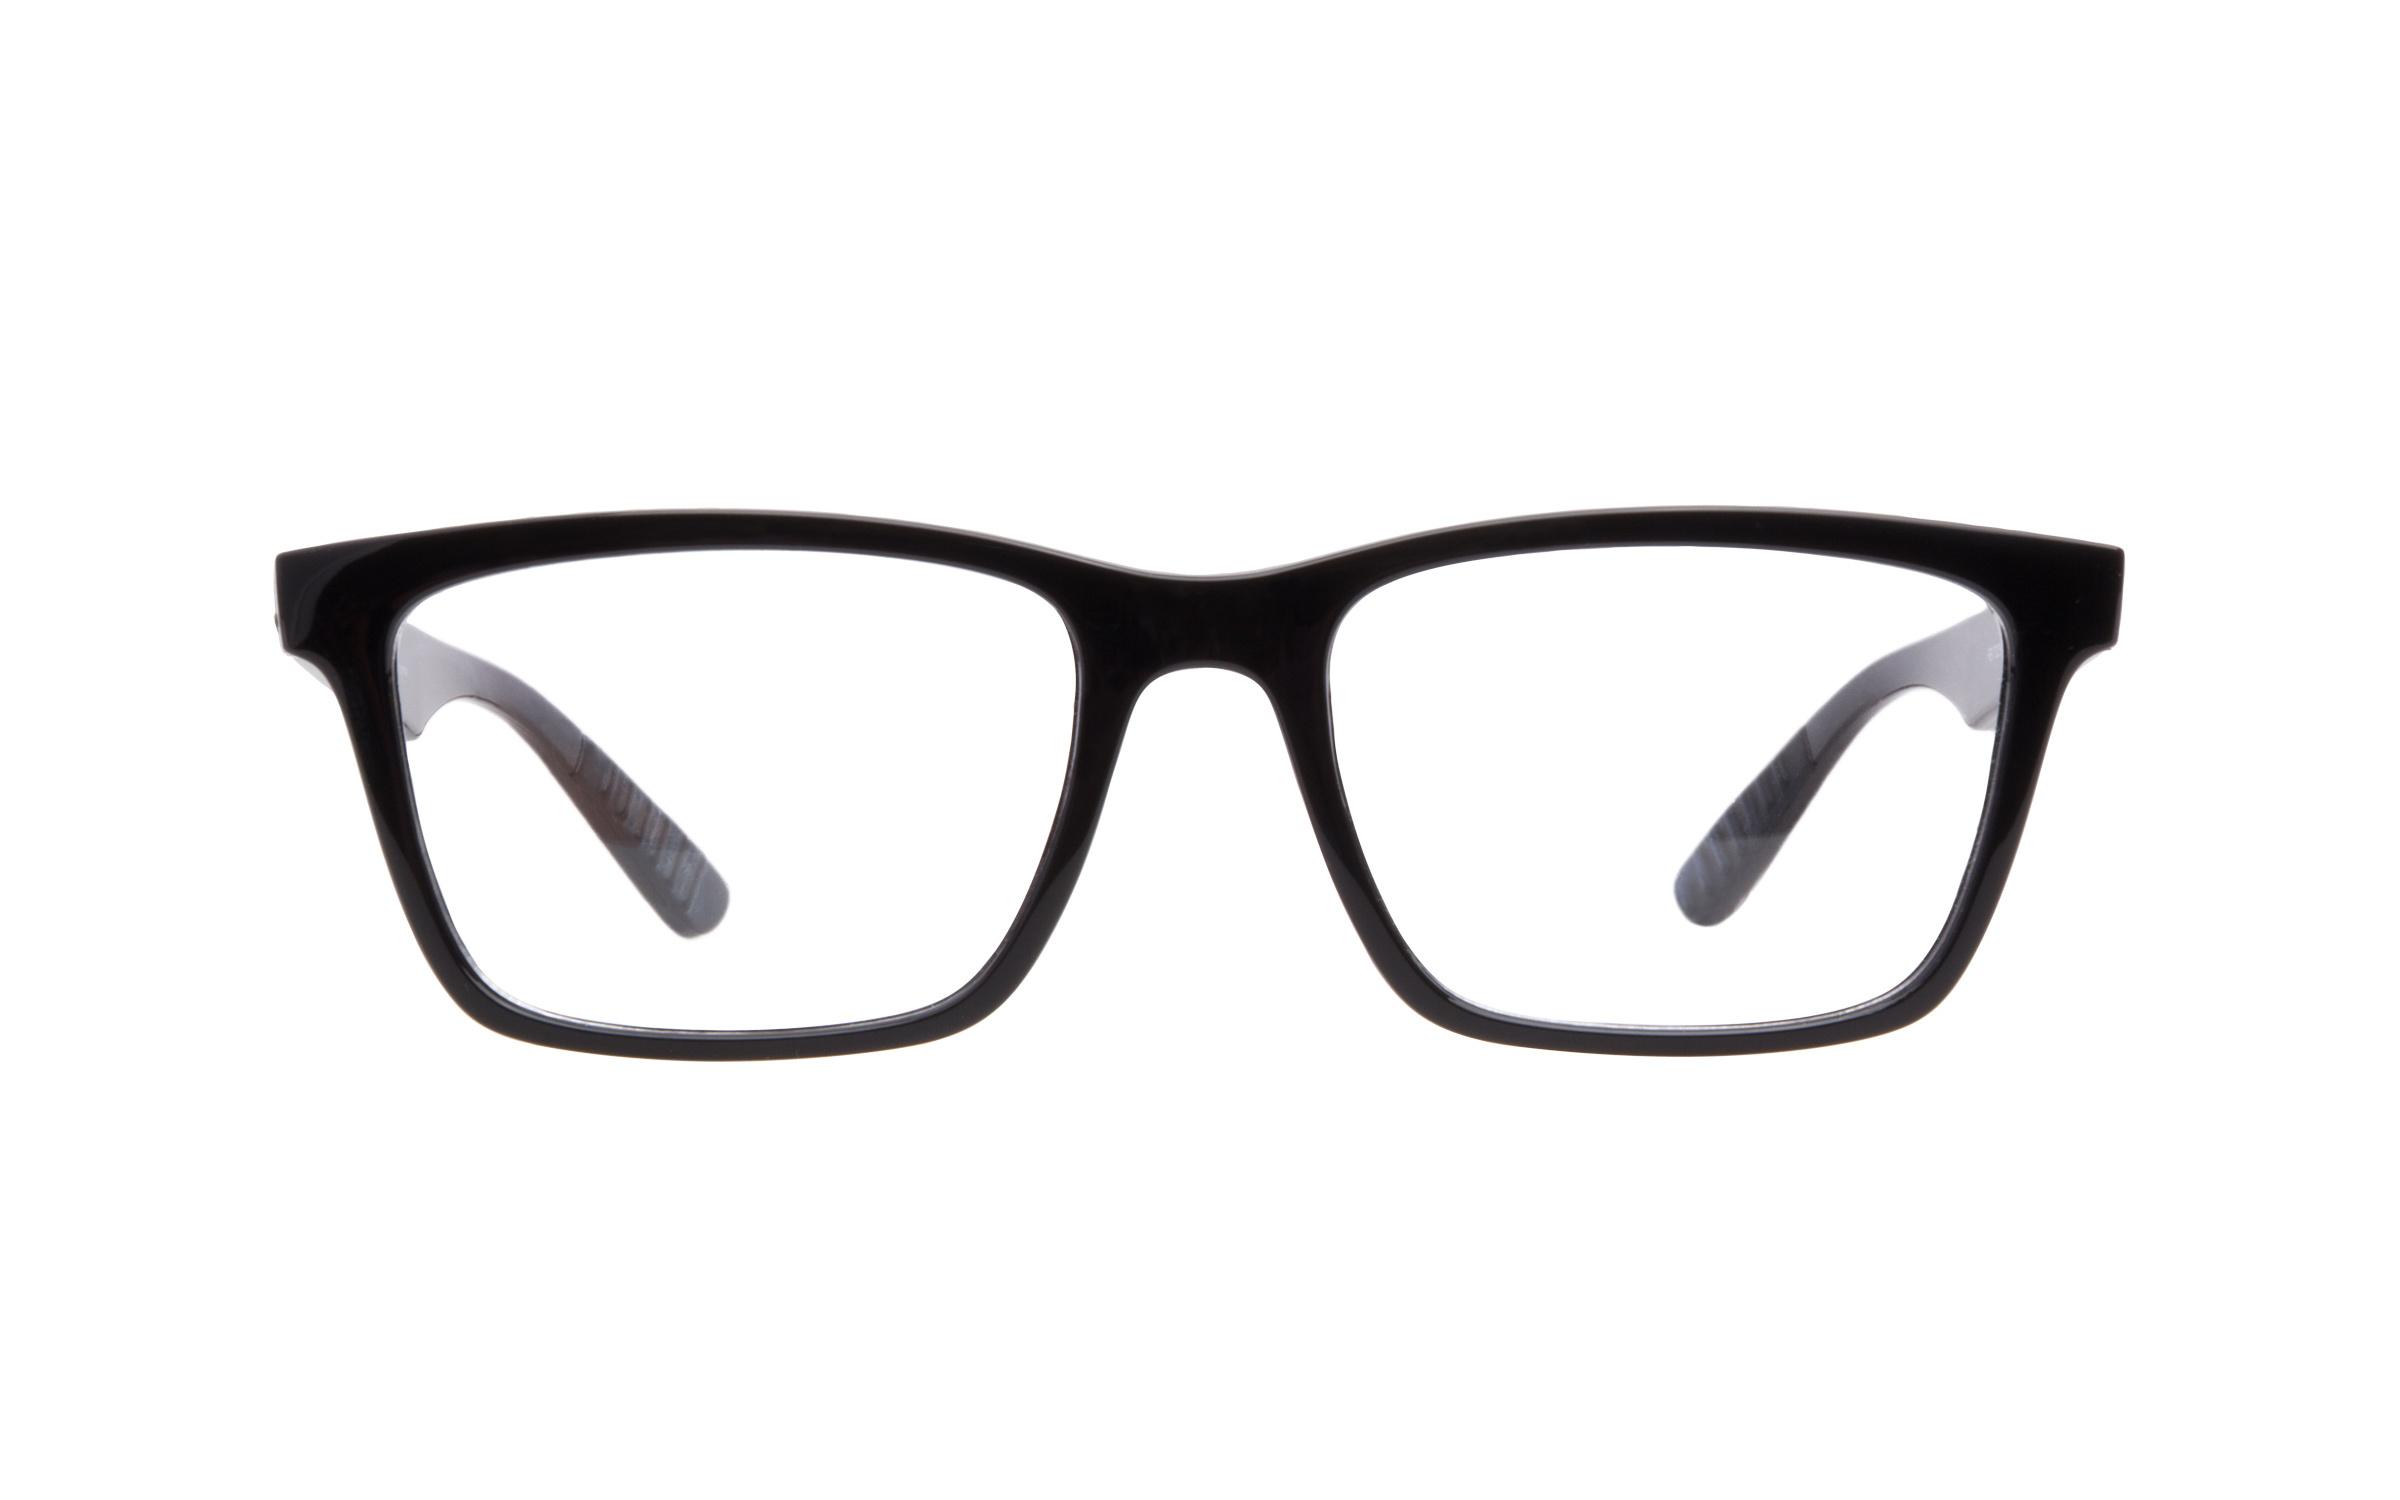 orange ban glasses highgate park